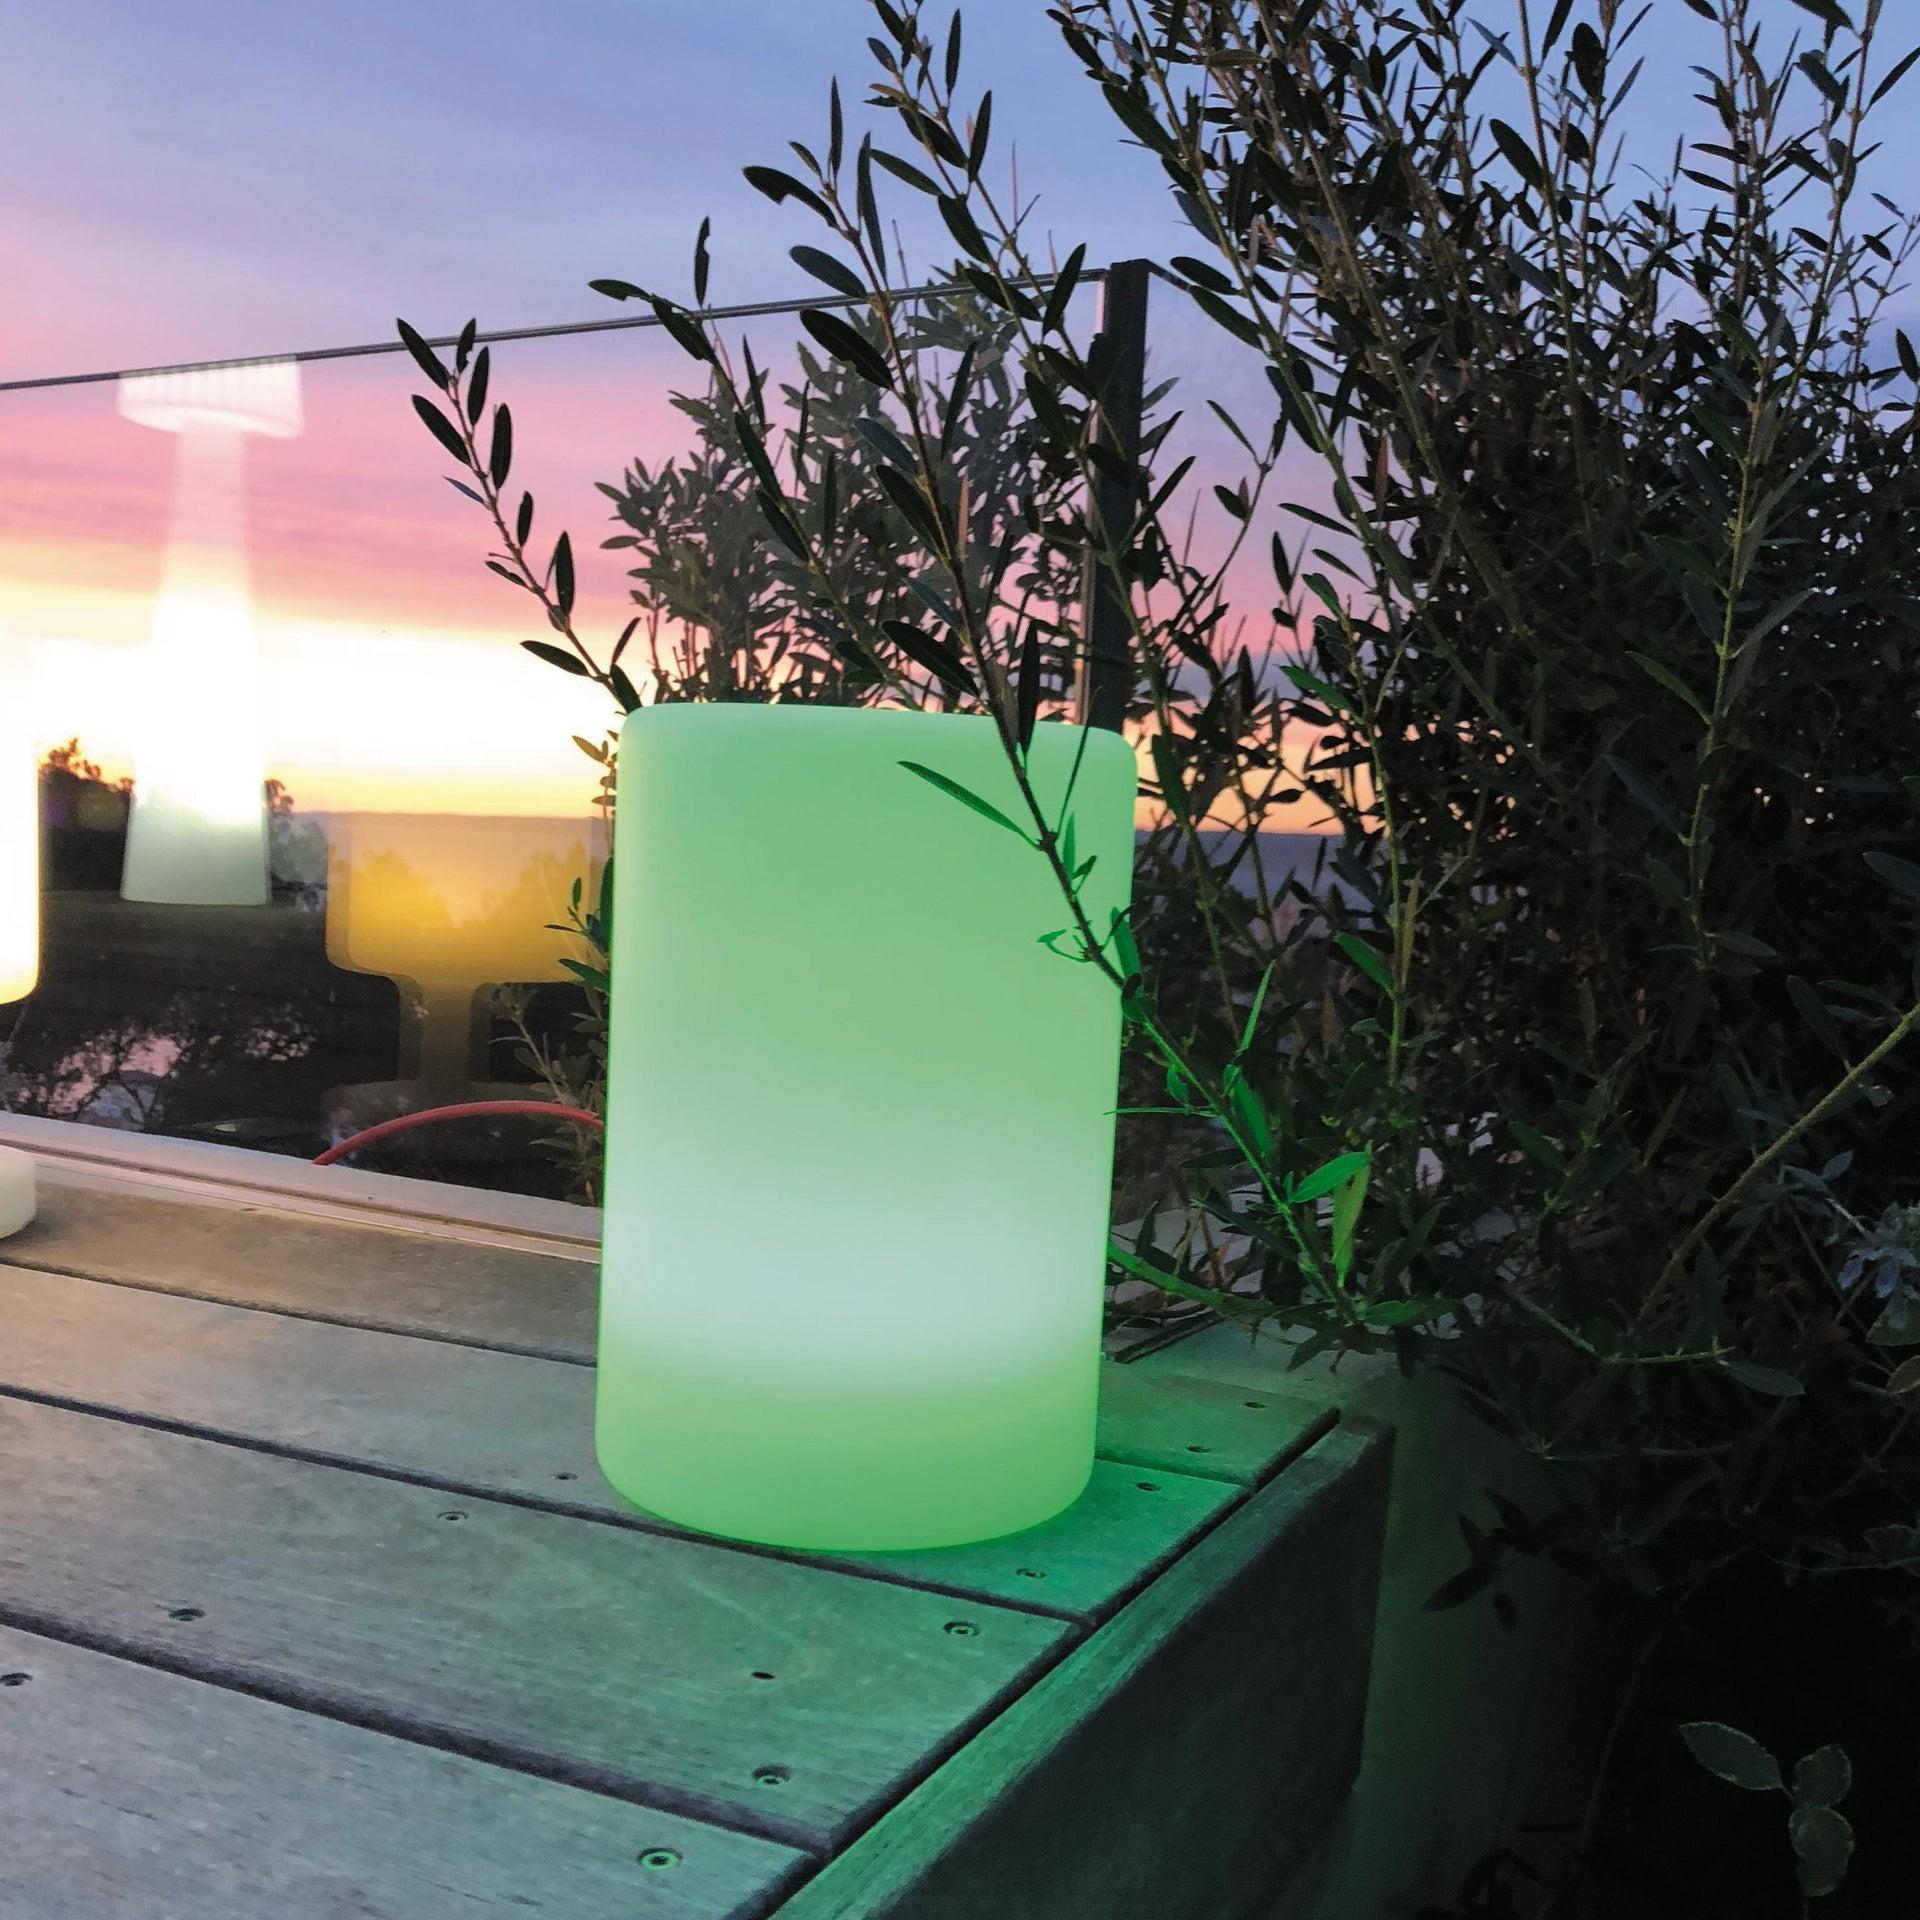 Lampada da esterno Alty H 24 cm, in resina, luce colori cangianti, LED integrato IP67 - 1